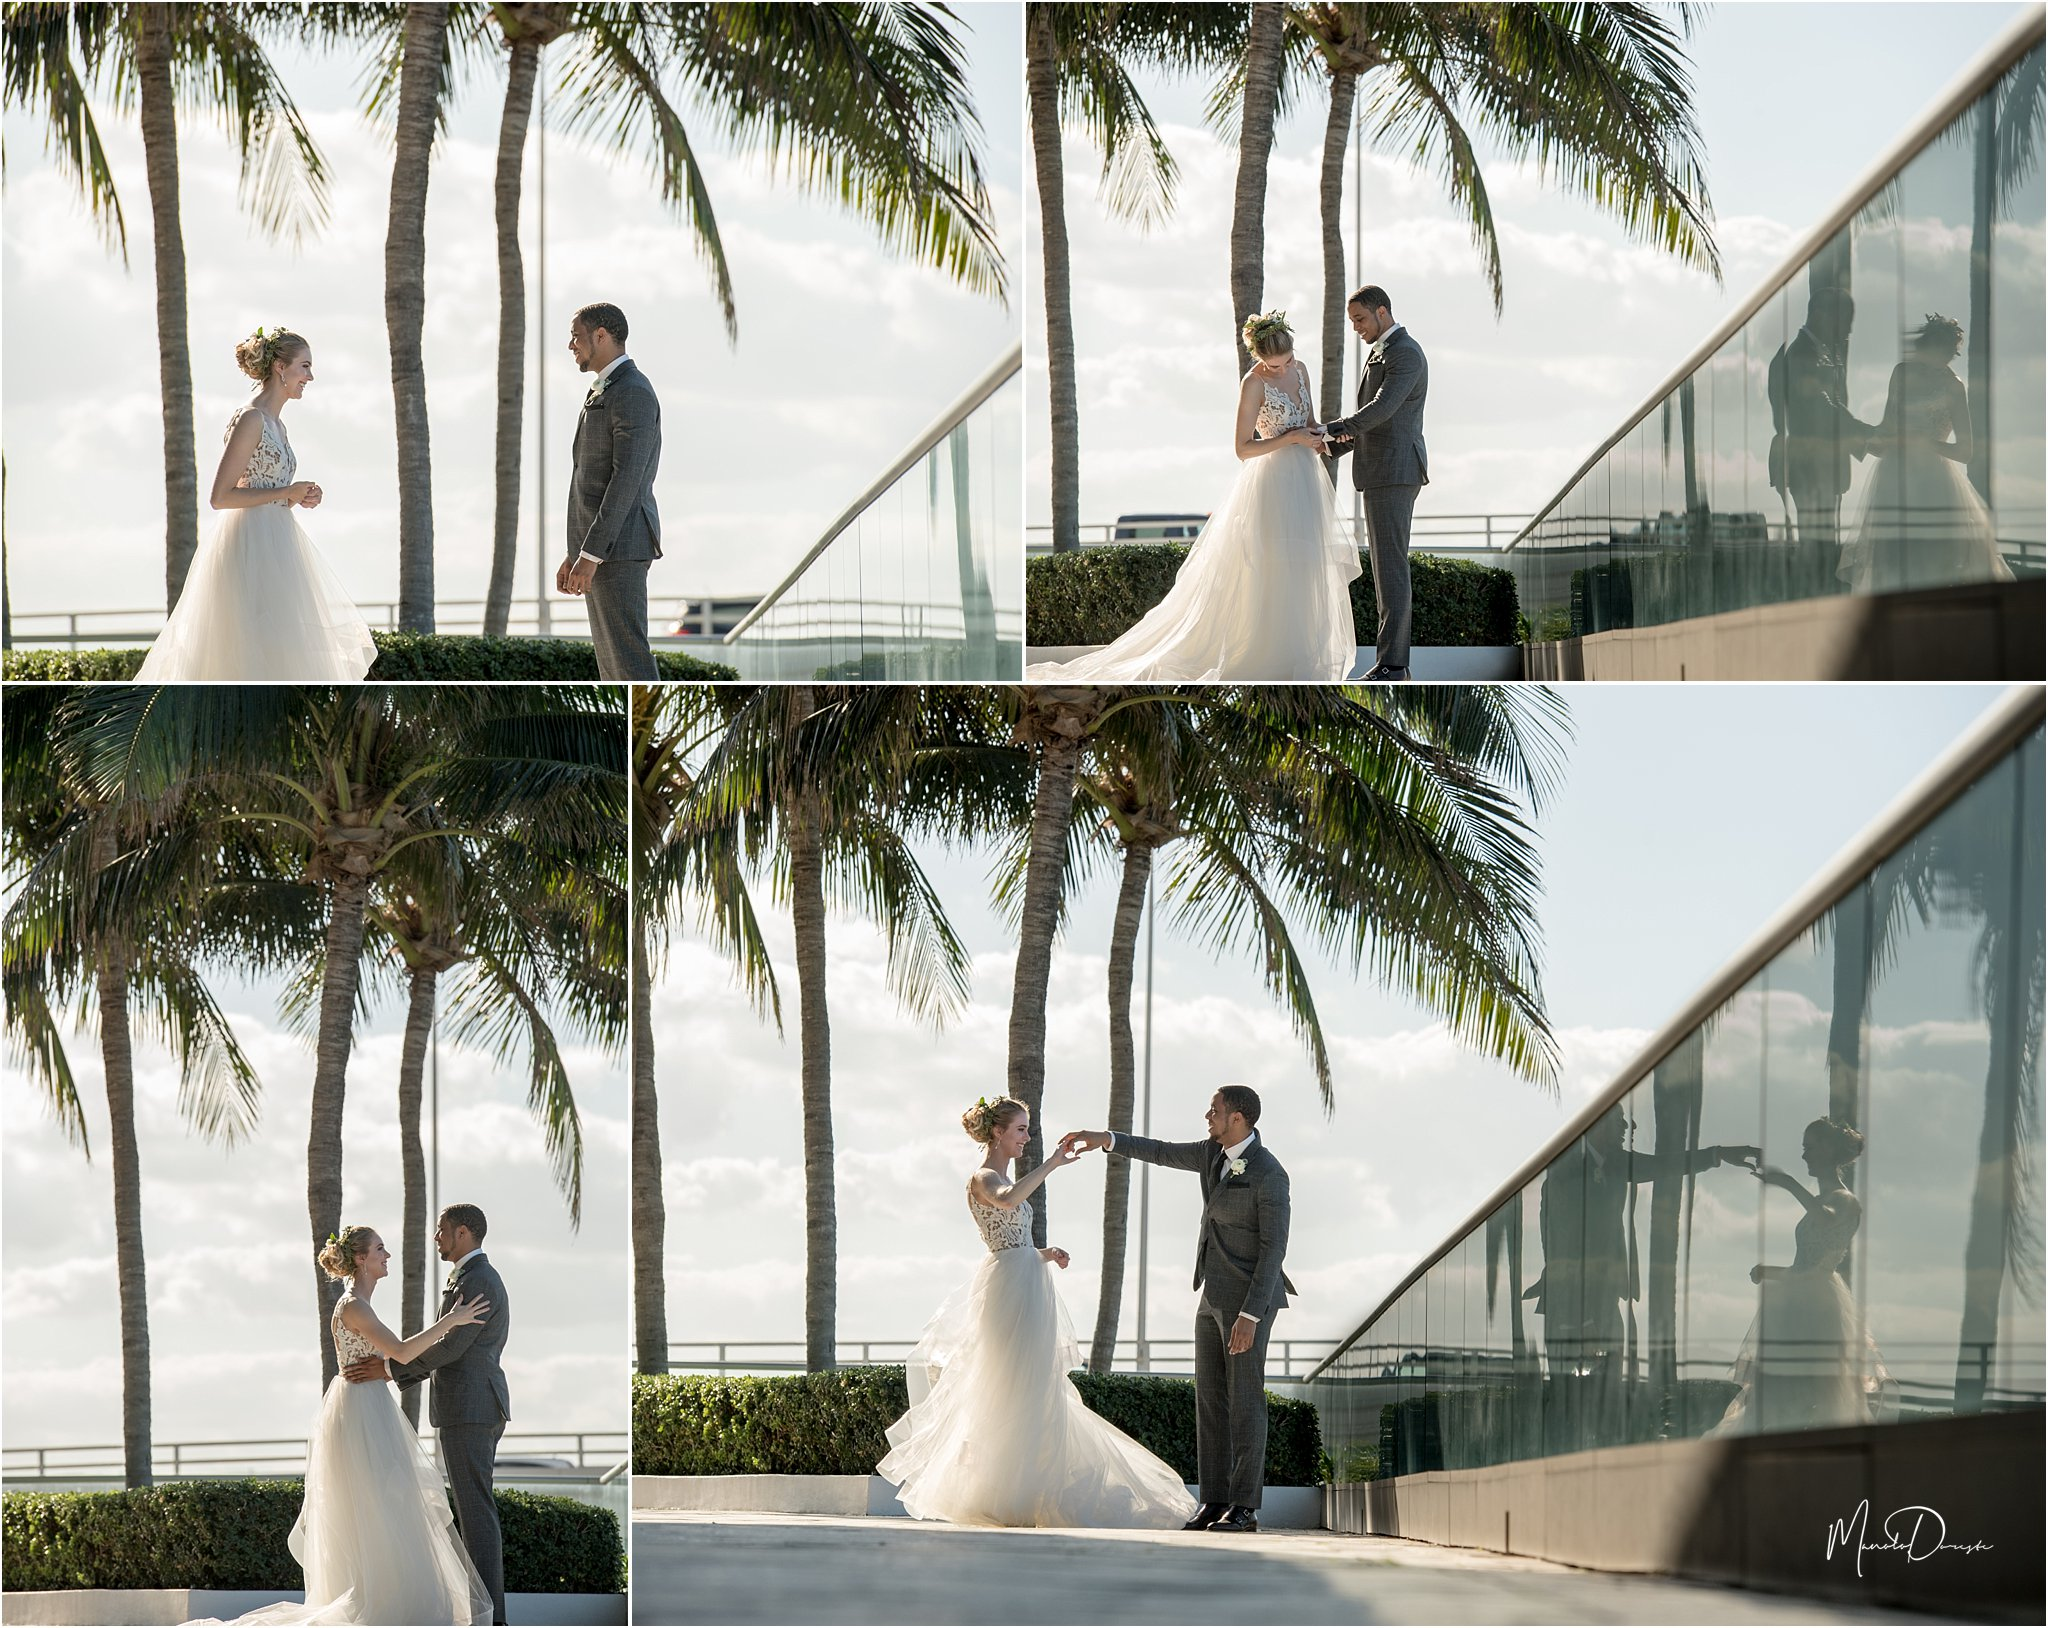 00880_ManoloDoreste_InFocusStudios_Wedding_Family_Photography_Miami_MiamiPhotographer.jpg